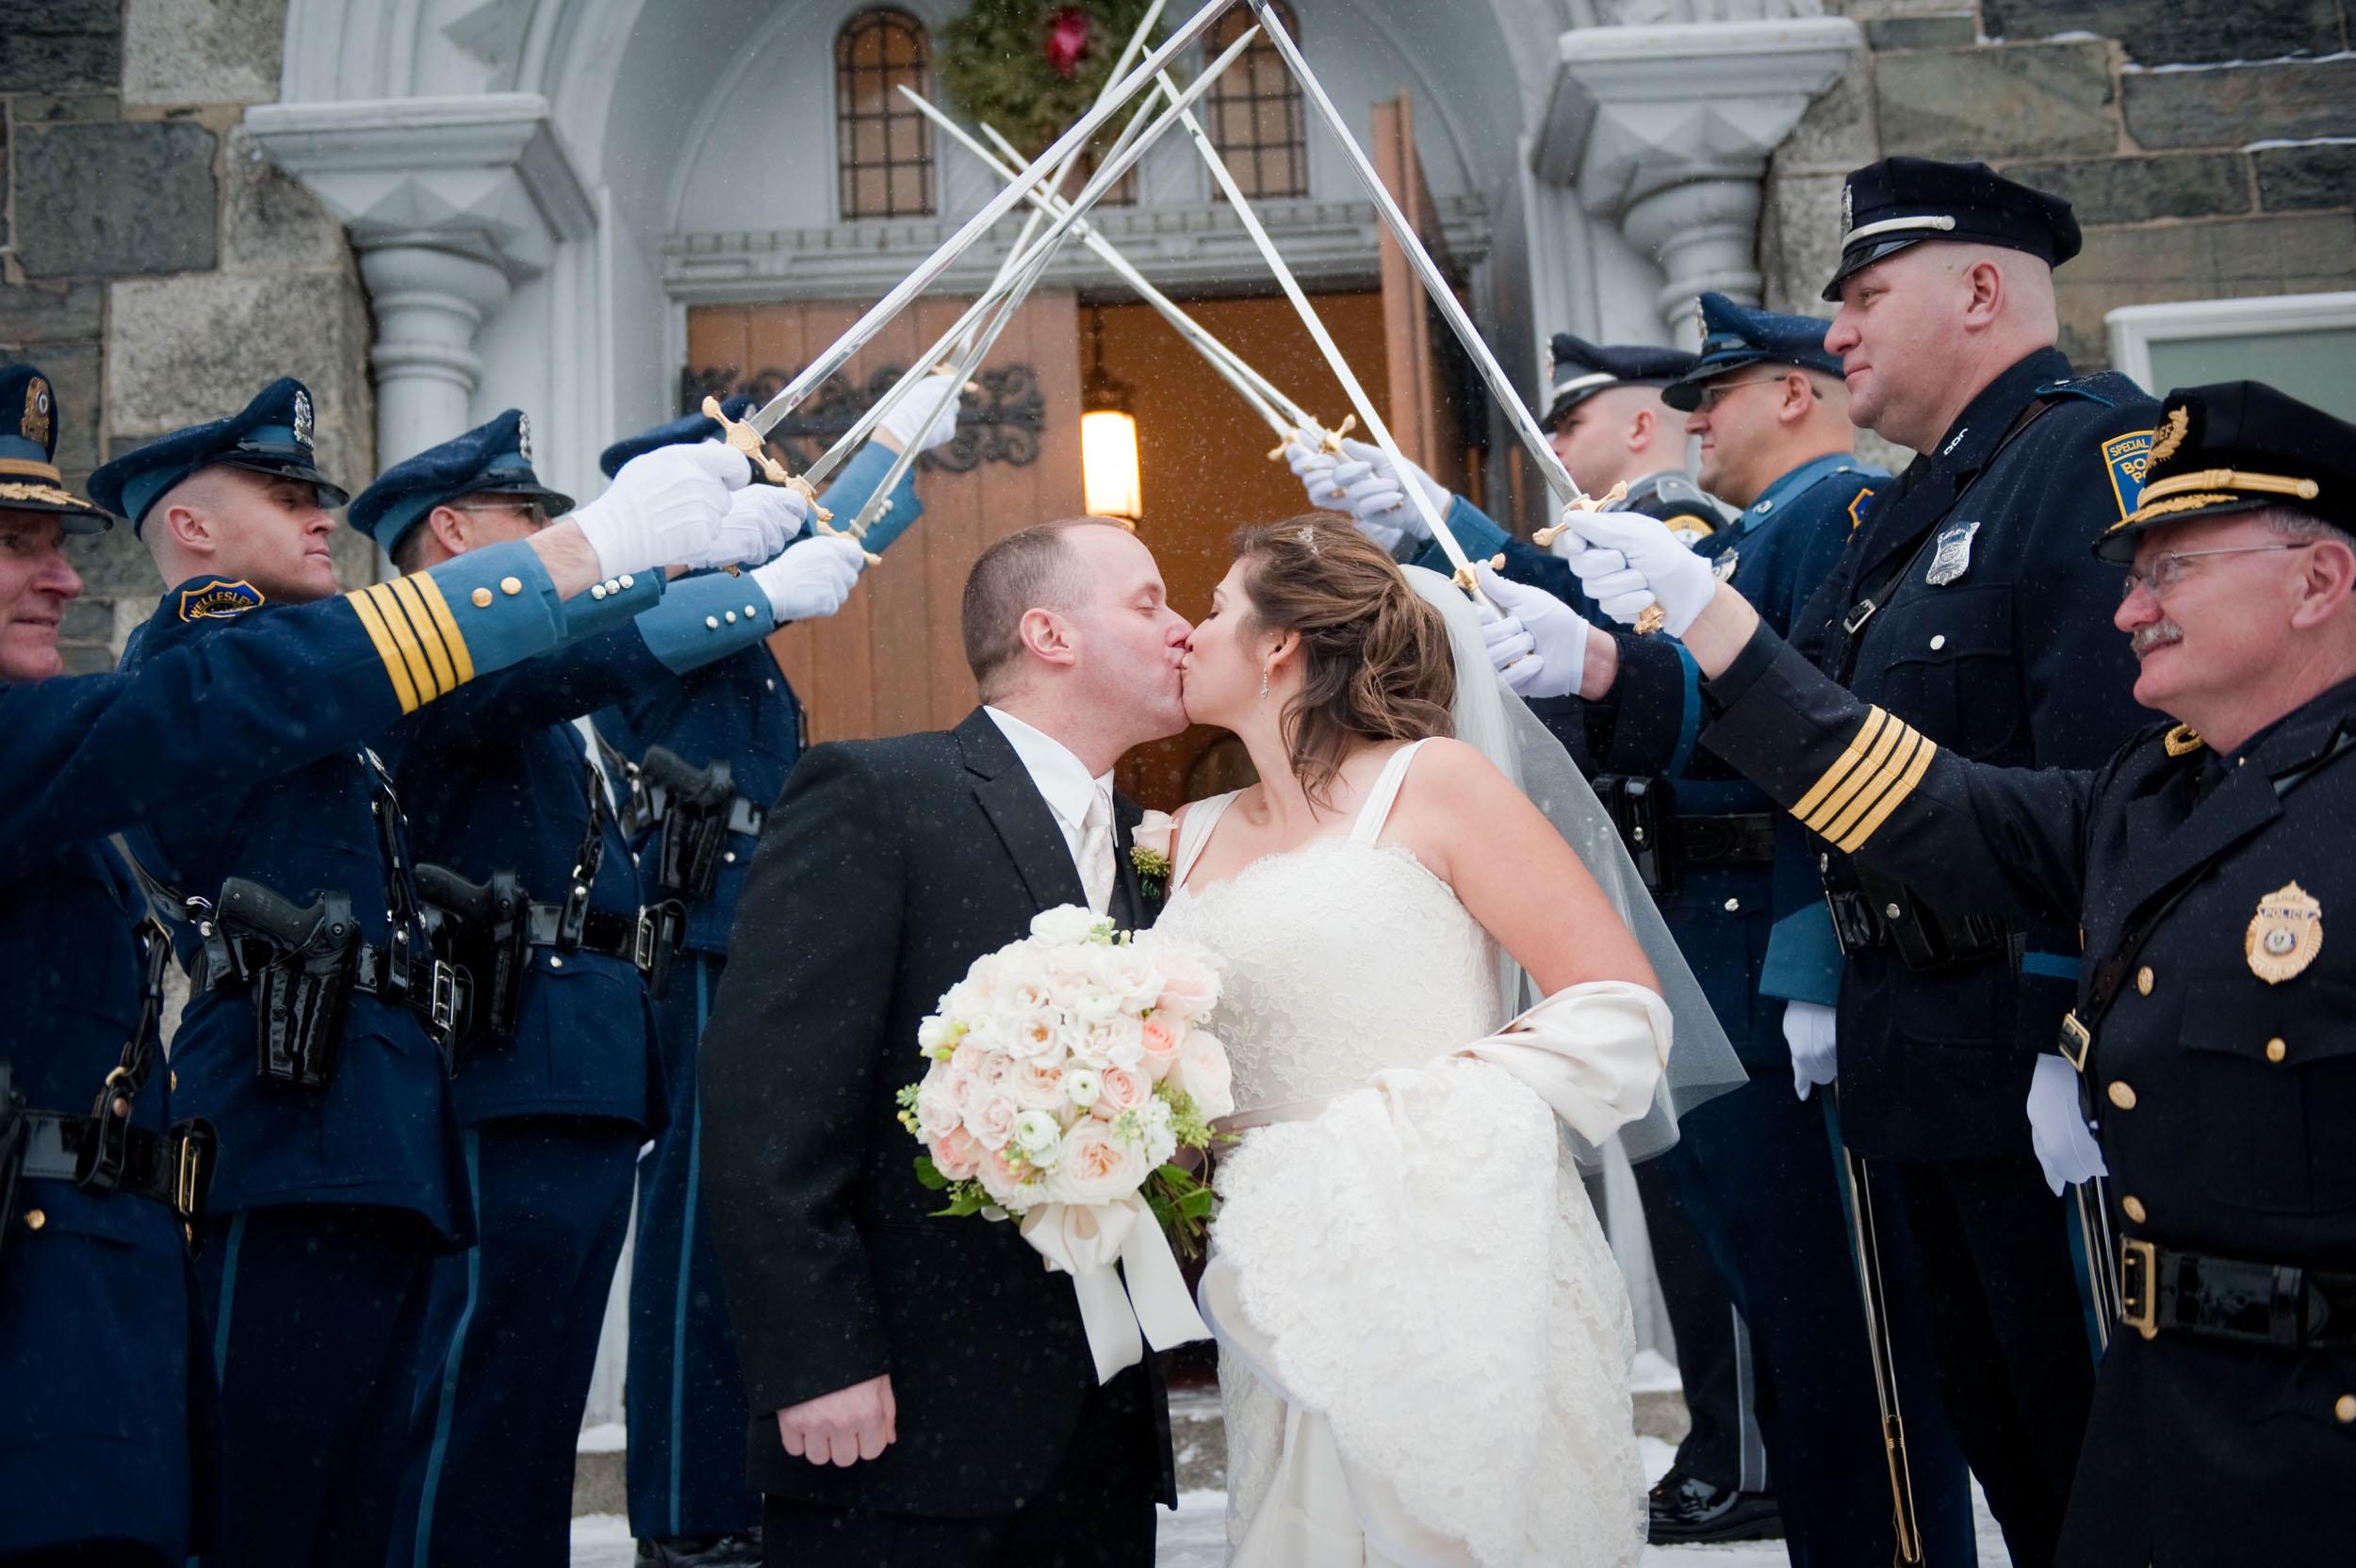 Wedding15Whittemore-357-2.jpg